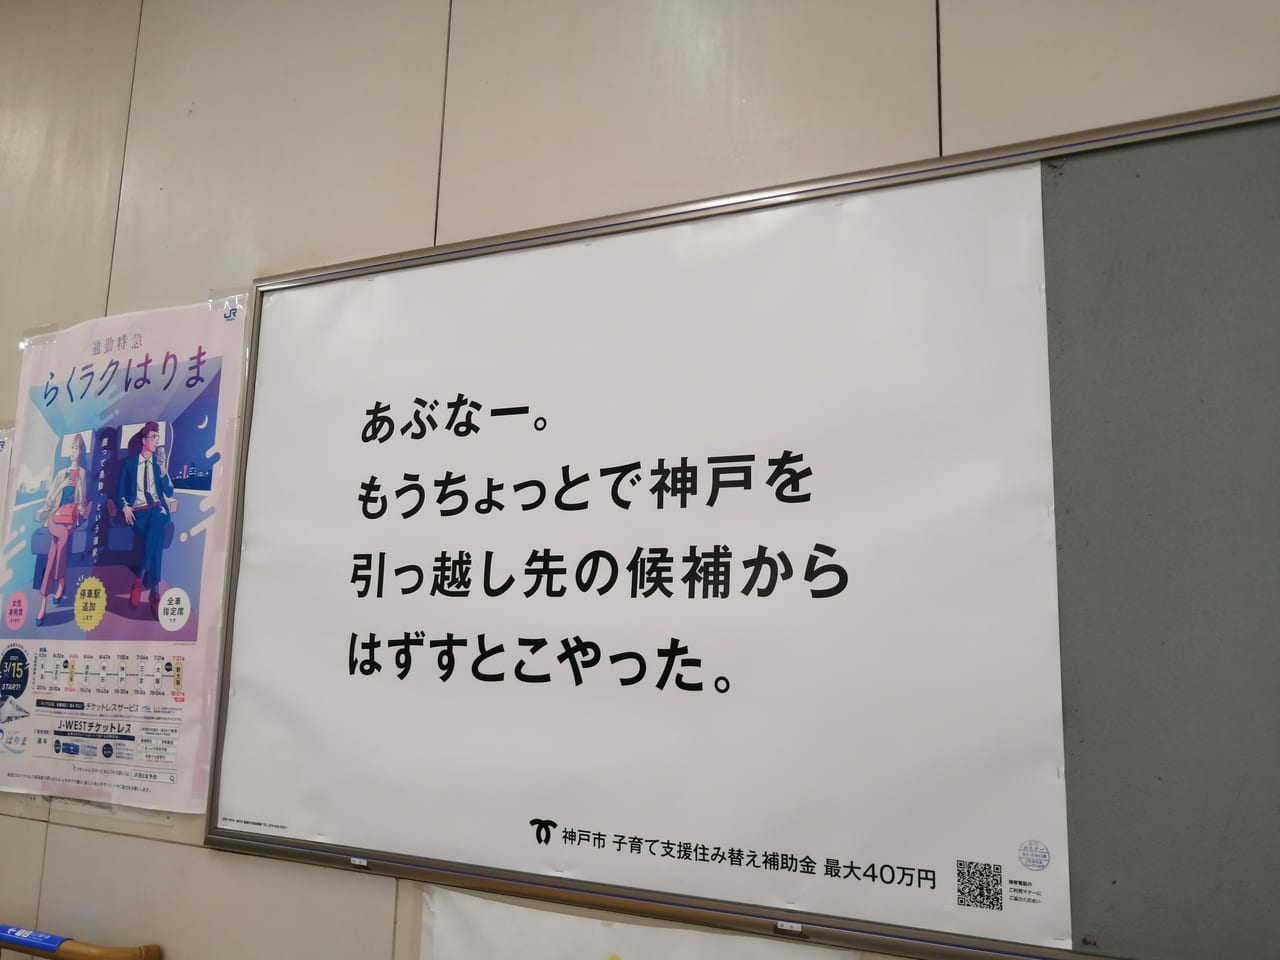 JR大久保駅の掲示